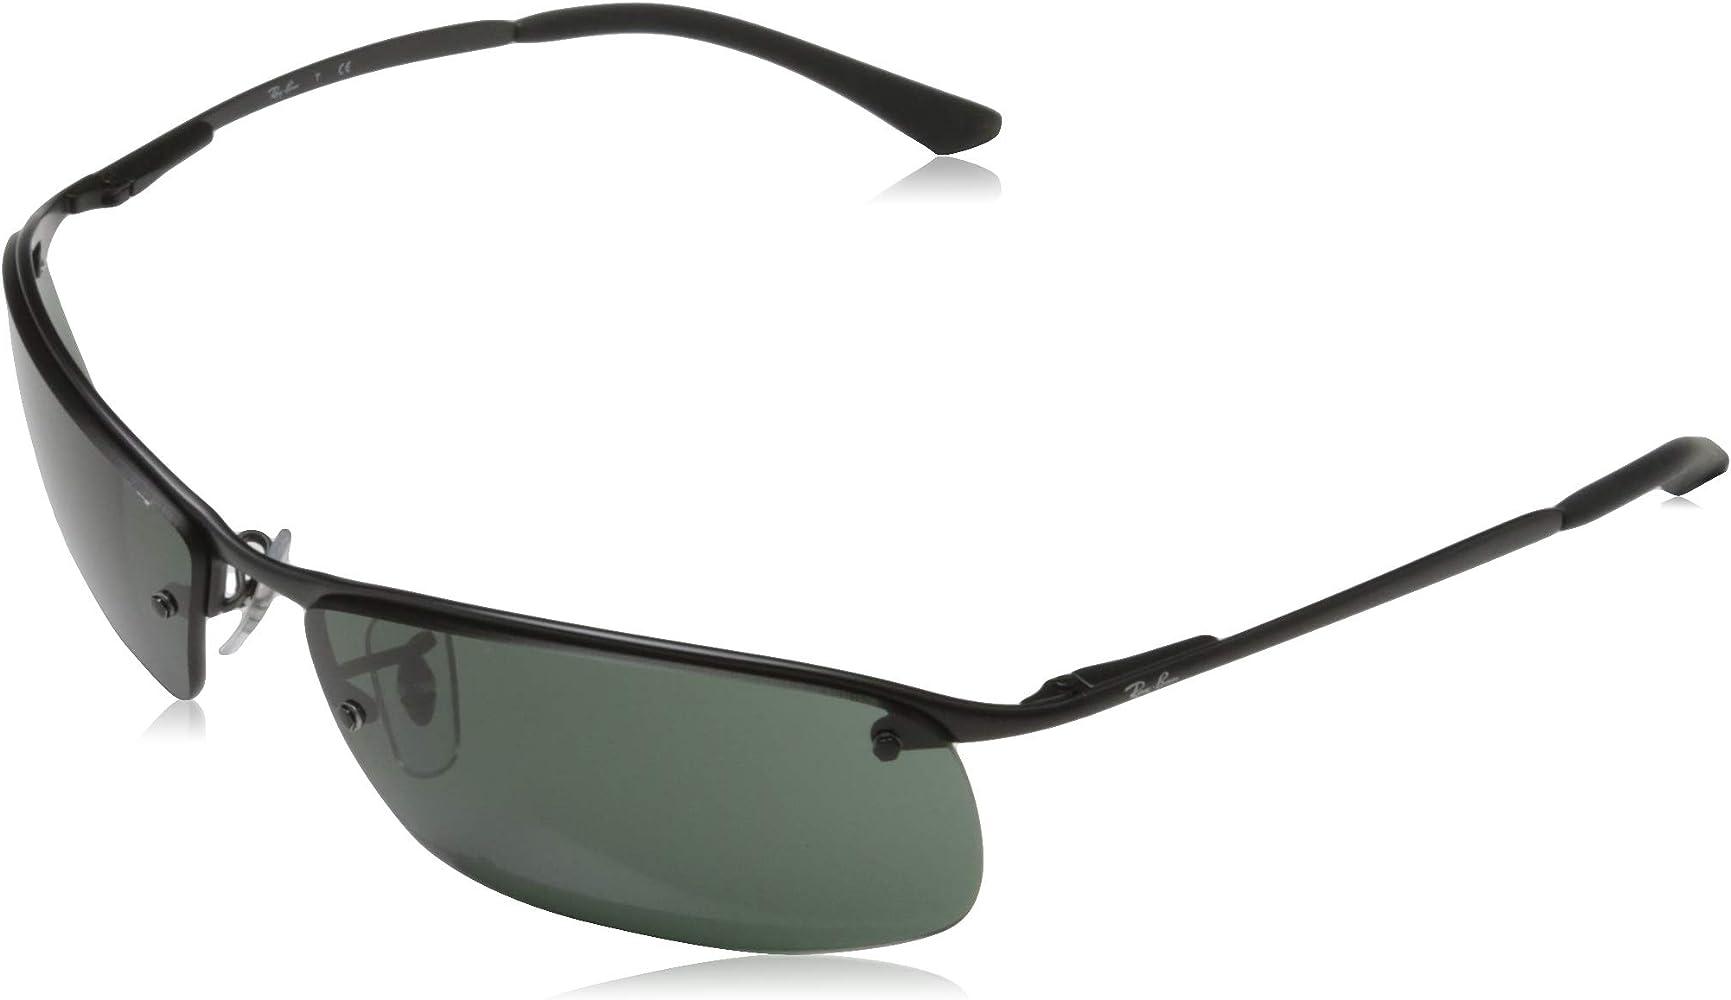 Ray-Ban 3025JM Gafas de sol, Negro, 55 para Hombre: Amazon.es ...